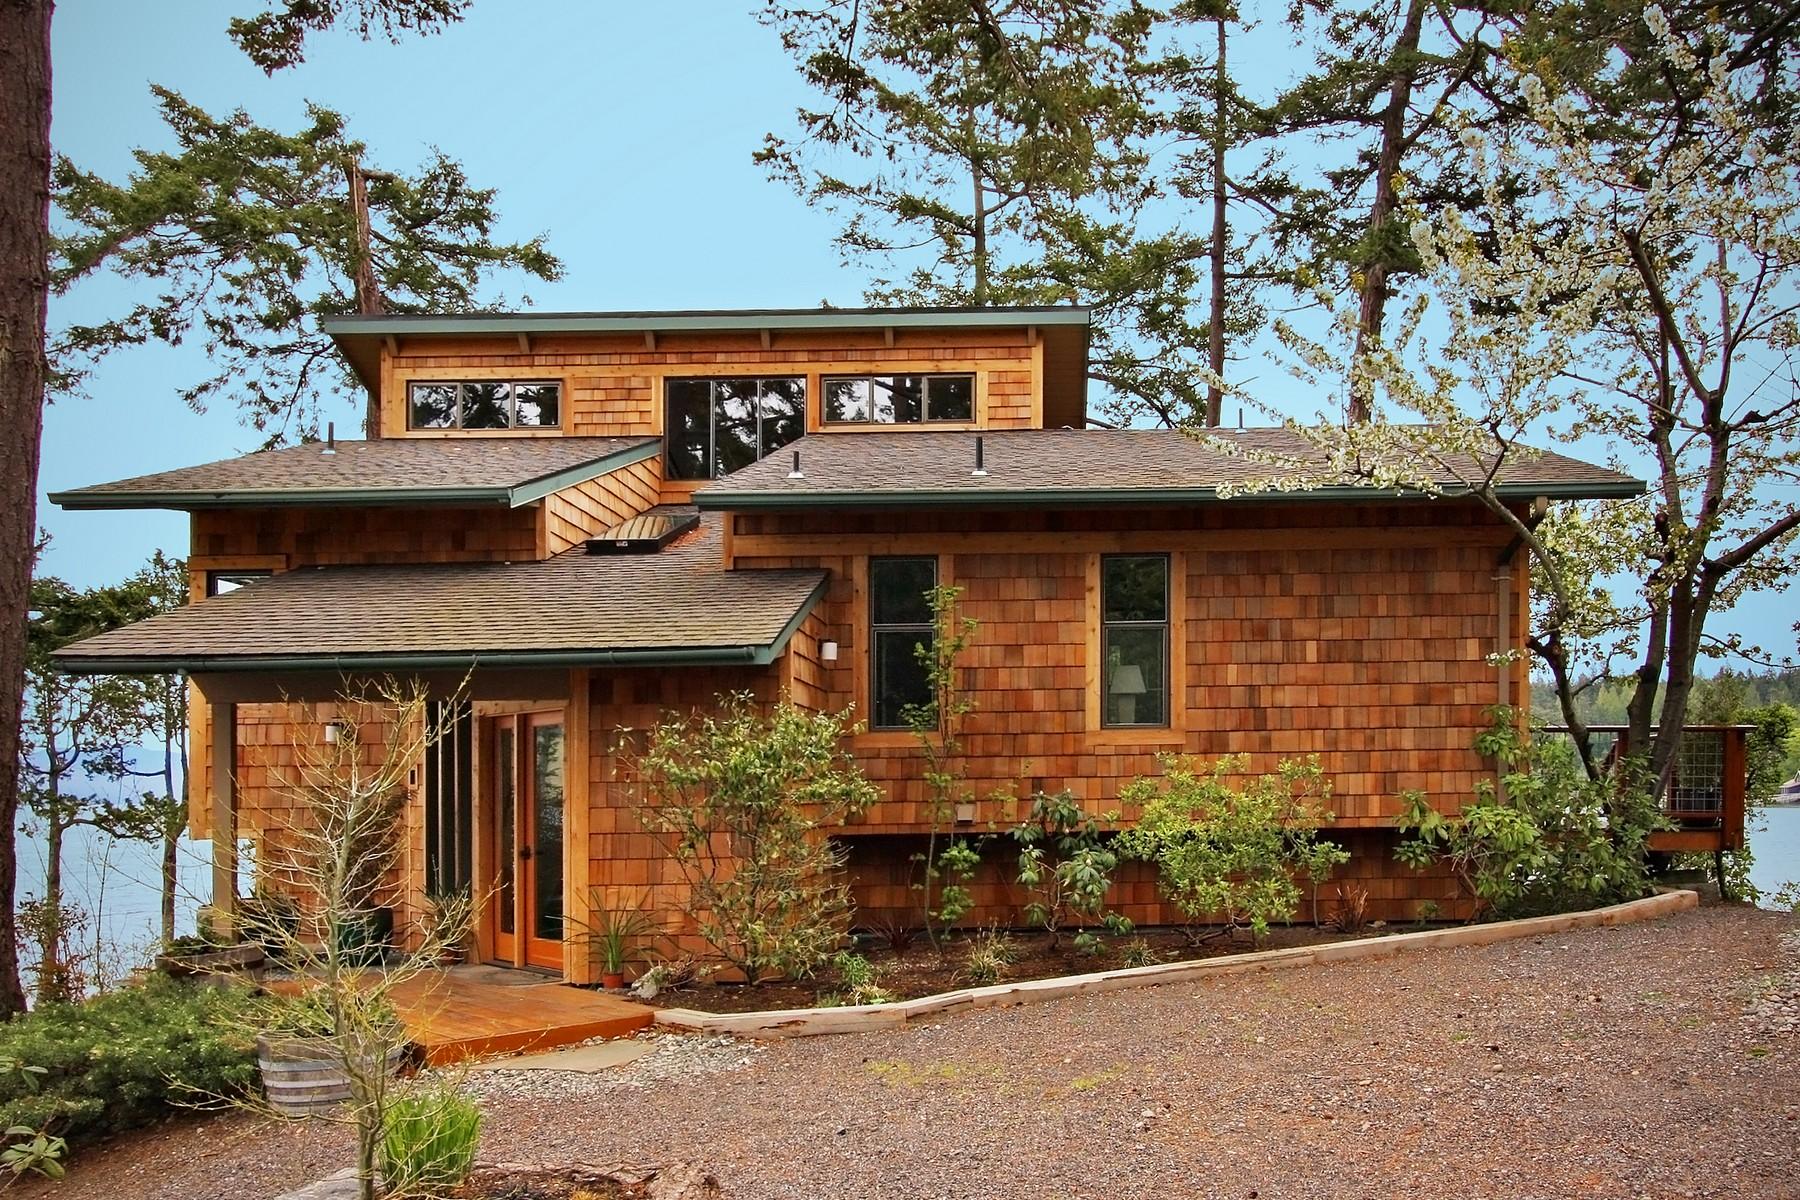 Single Family Home for Sale at Las Tres Vistas 521 Davison Head Drive Friday Harbor, Washington 98250 United States